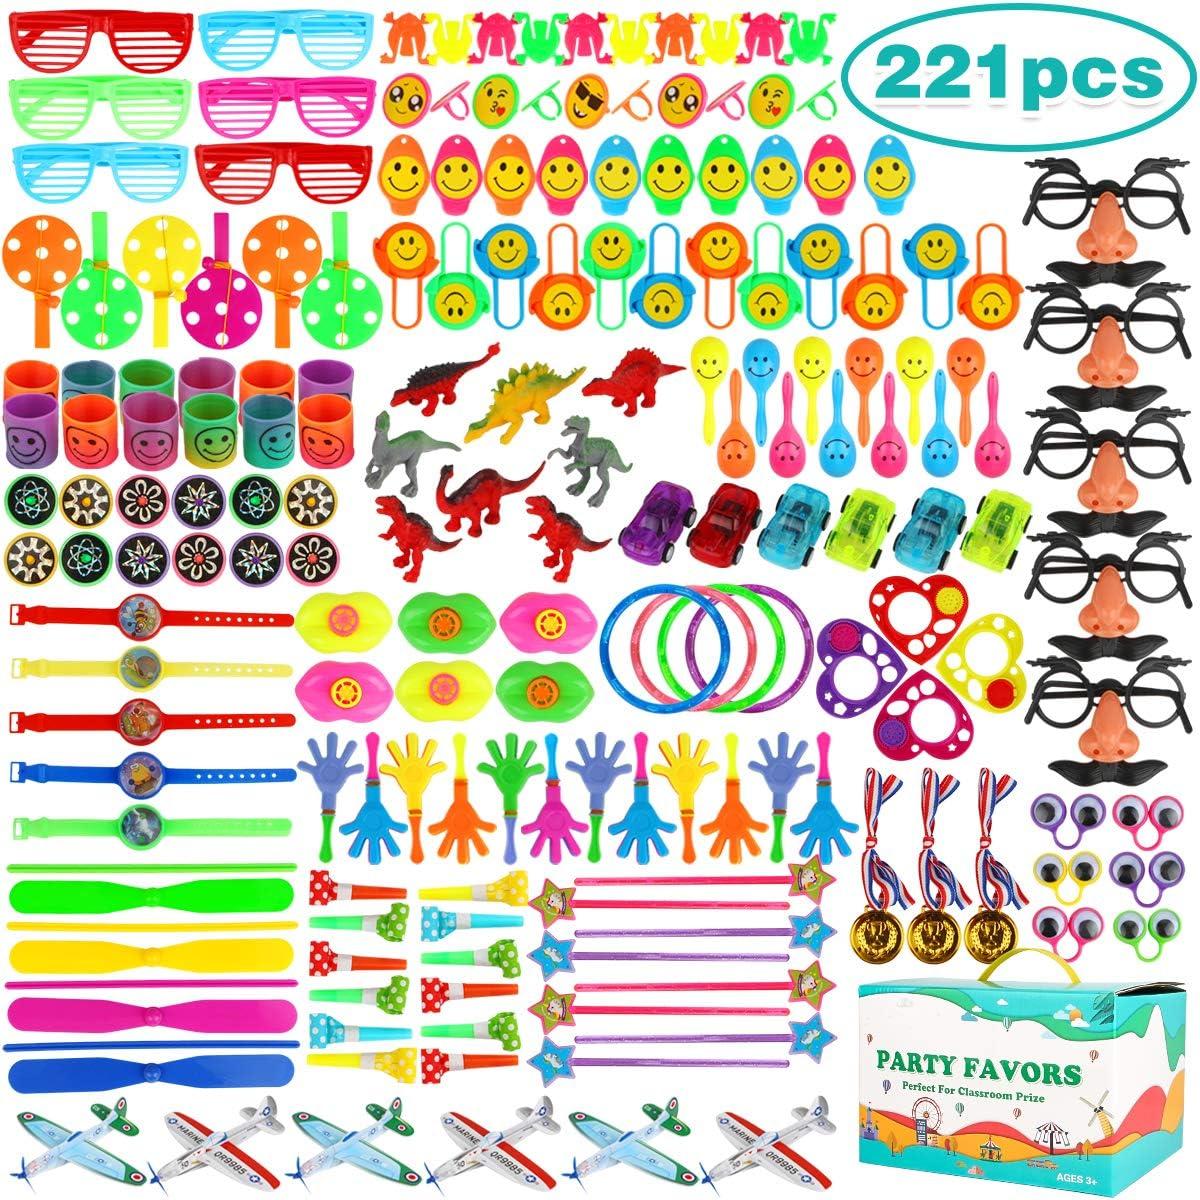 Aitbay 221PCS Party Favors for Kids Bulk, Carnival Prizes, Classroom Rewards, Pinata Filler Easter Egg Filler Toys, Birthday Party Bulk Toy Assortment Box for Boys and Girls